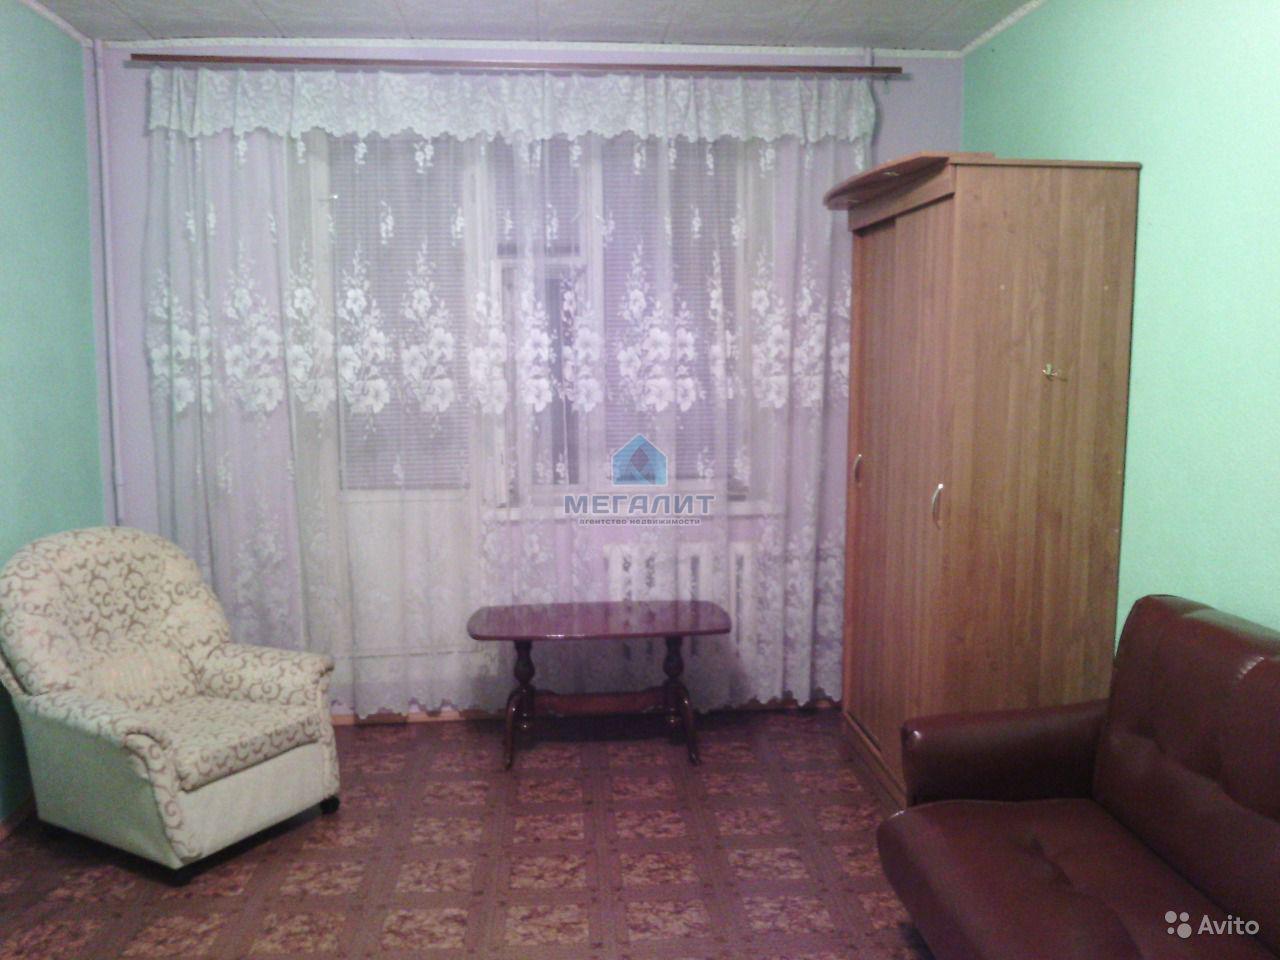 Аренда 1-к квартиры Братьев Касимовых 6А, 45.0 м² (миниатюра №1)